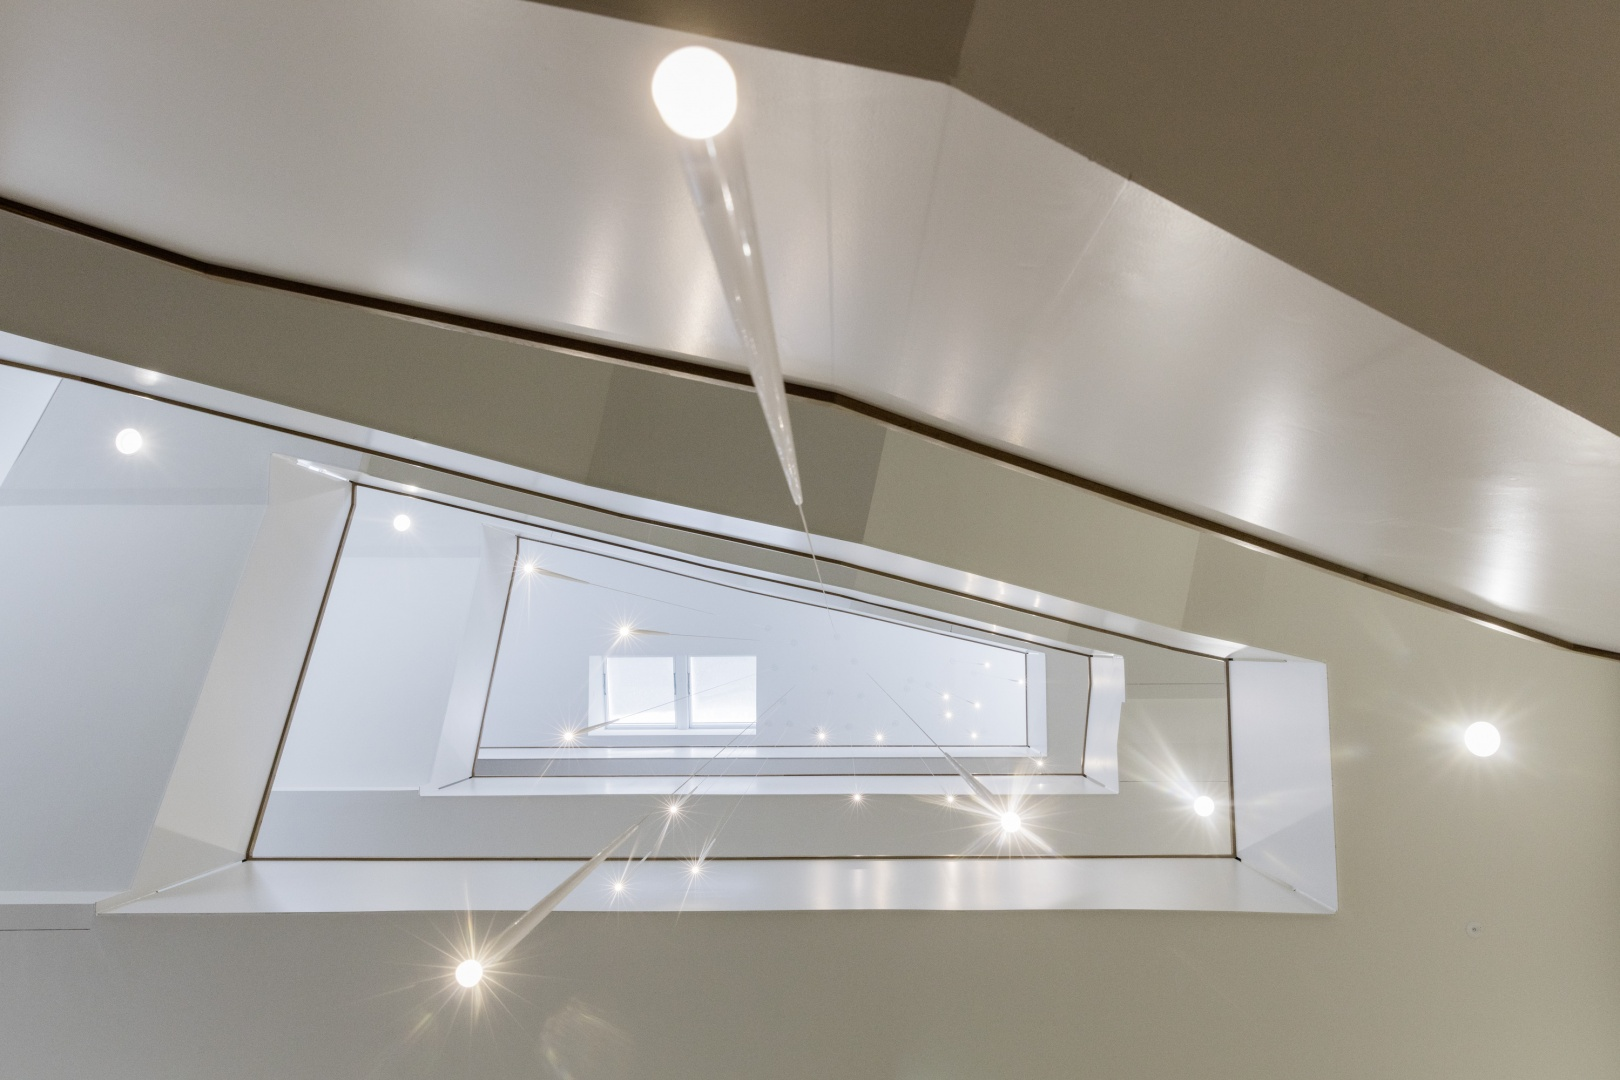 Escalier principal © Berit Klinik